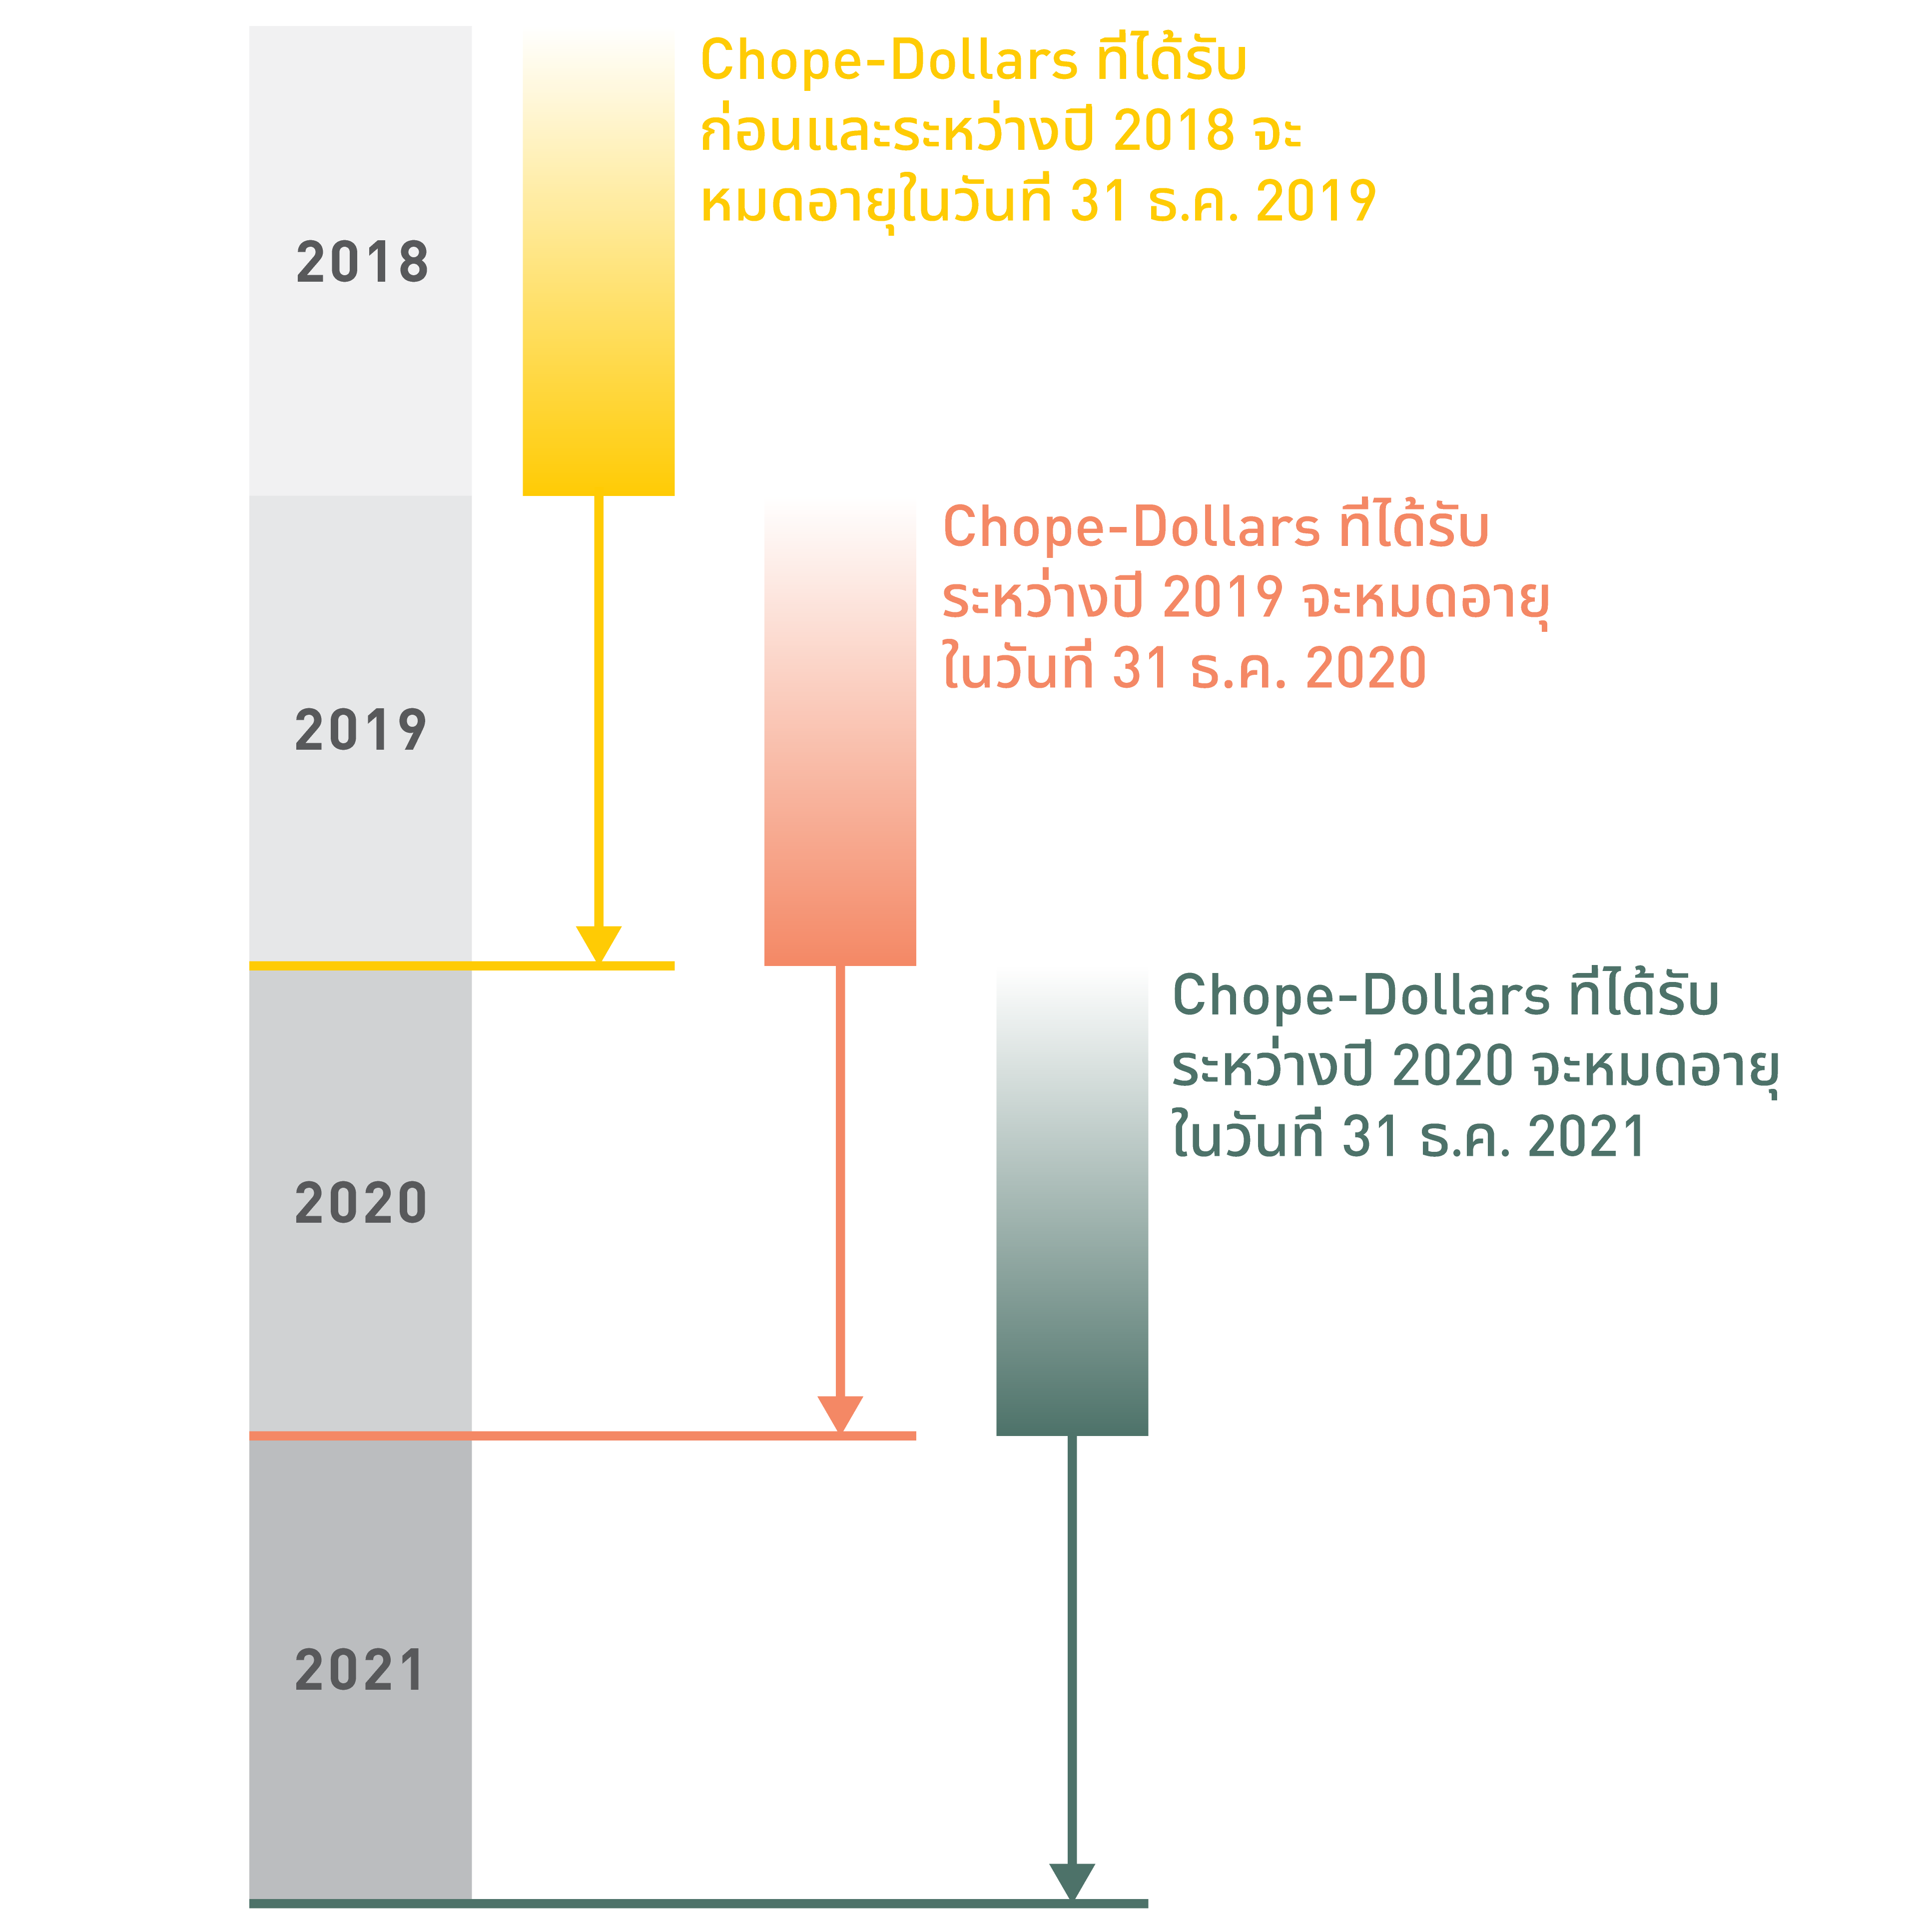 Chope-Dollars Expiry